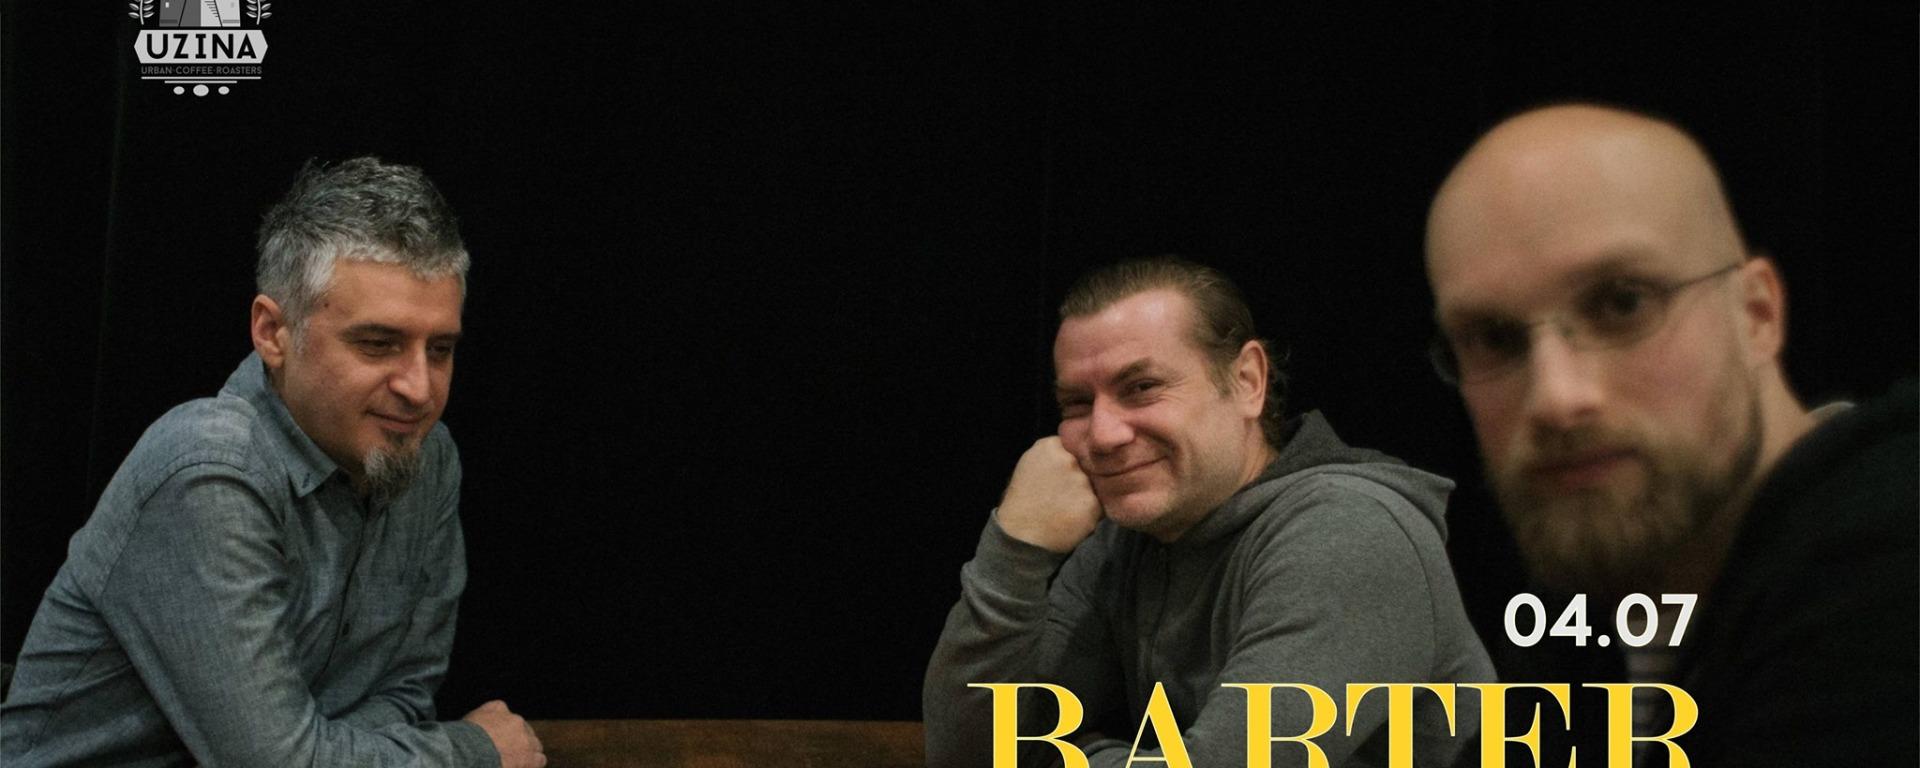 Seria Deconectat #69 • Barter LIVE at Uzina Coffee